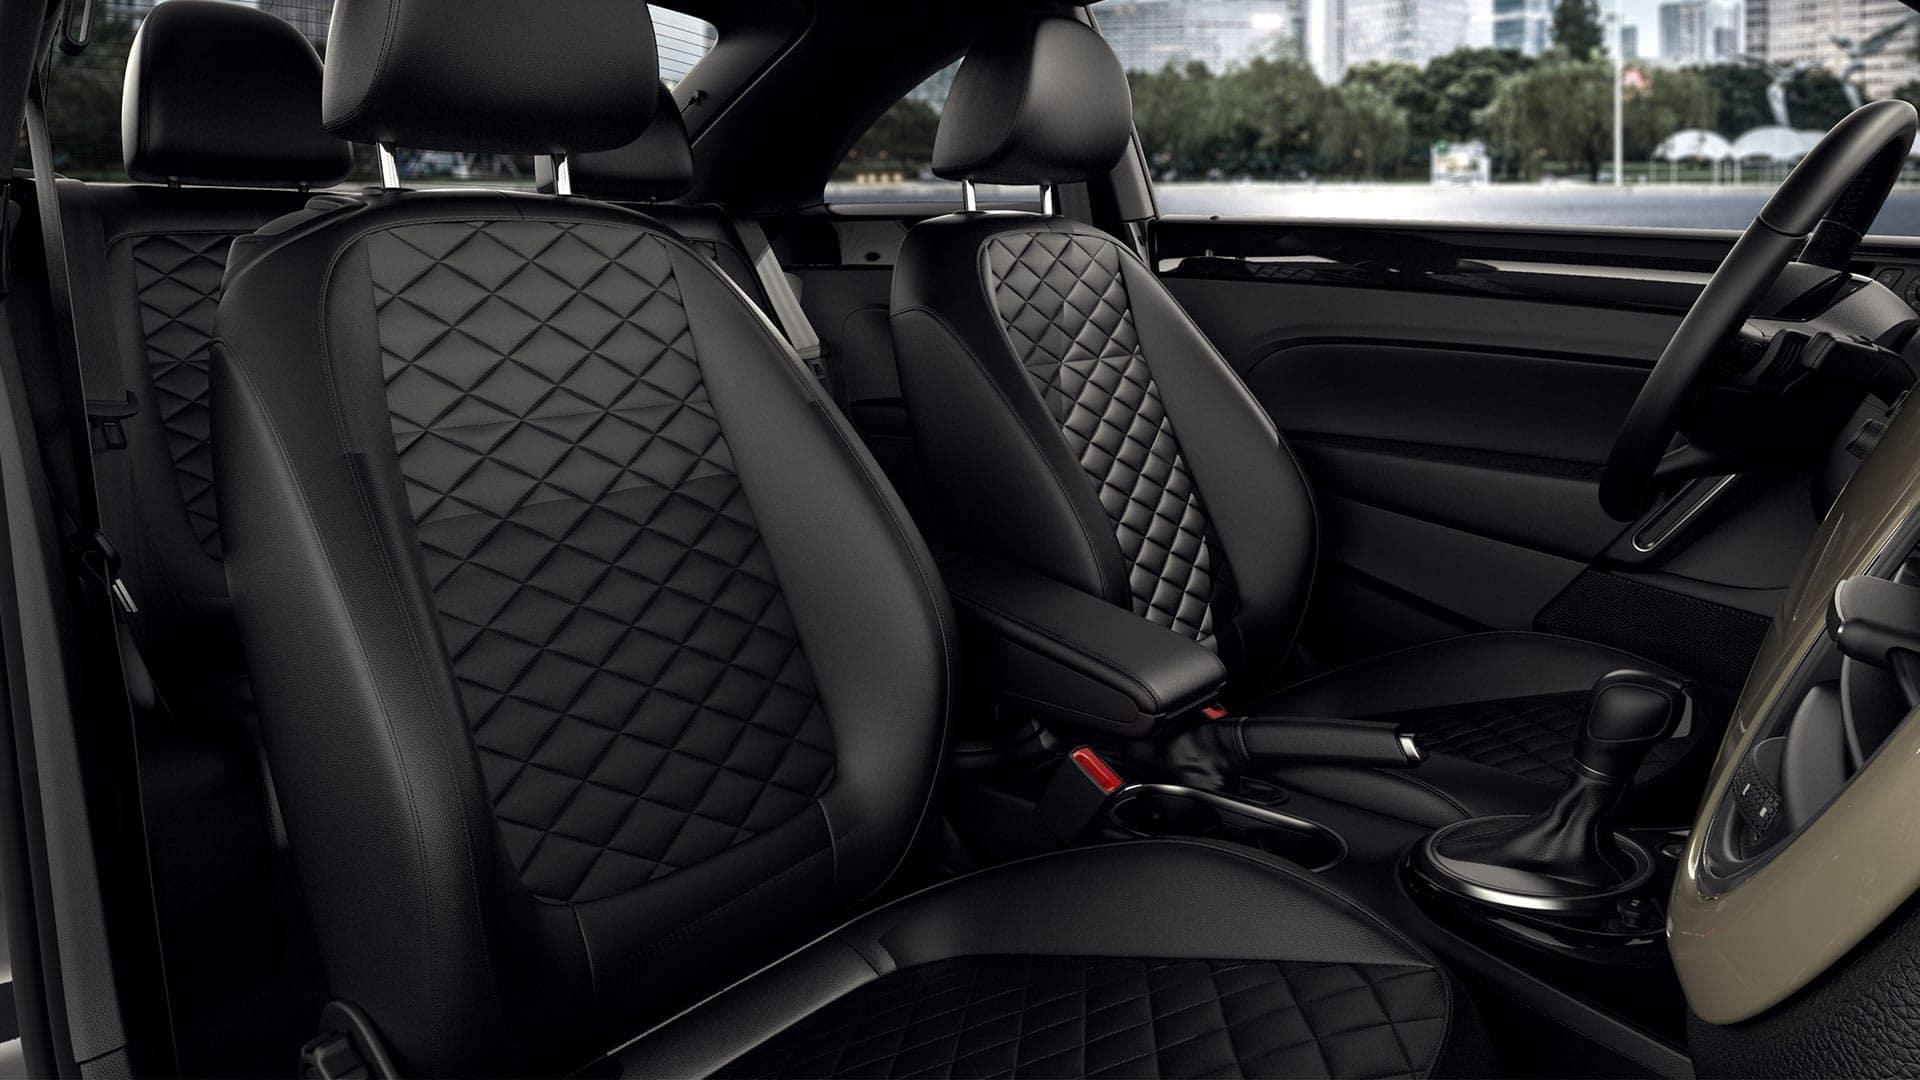 2019 VW Beetle diamond seats